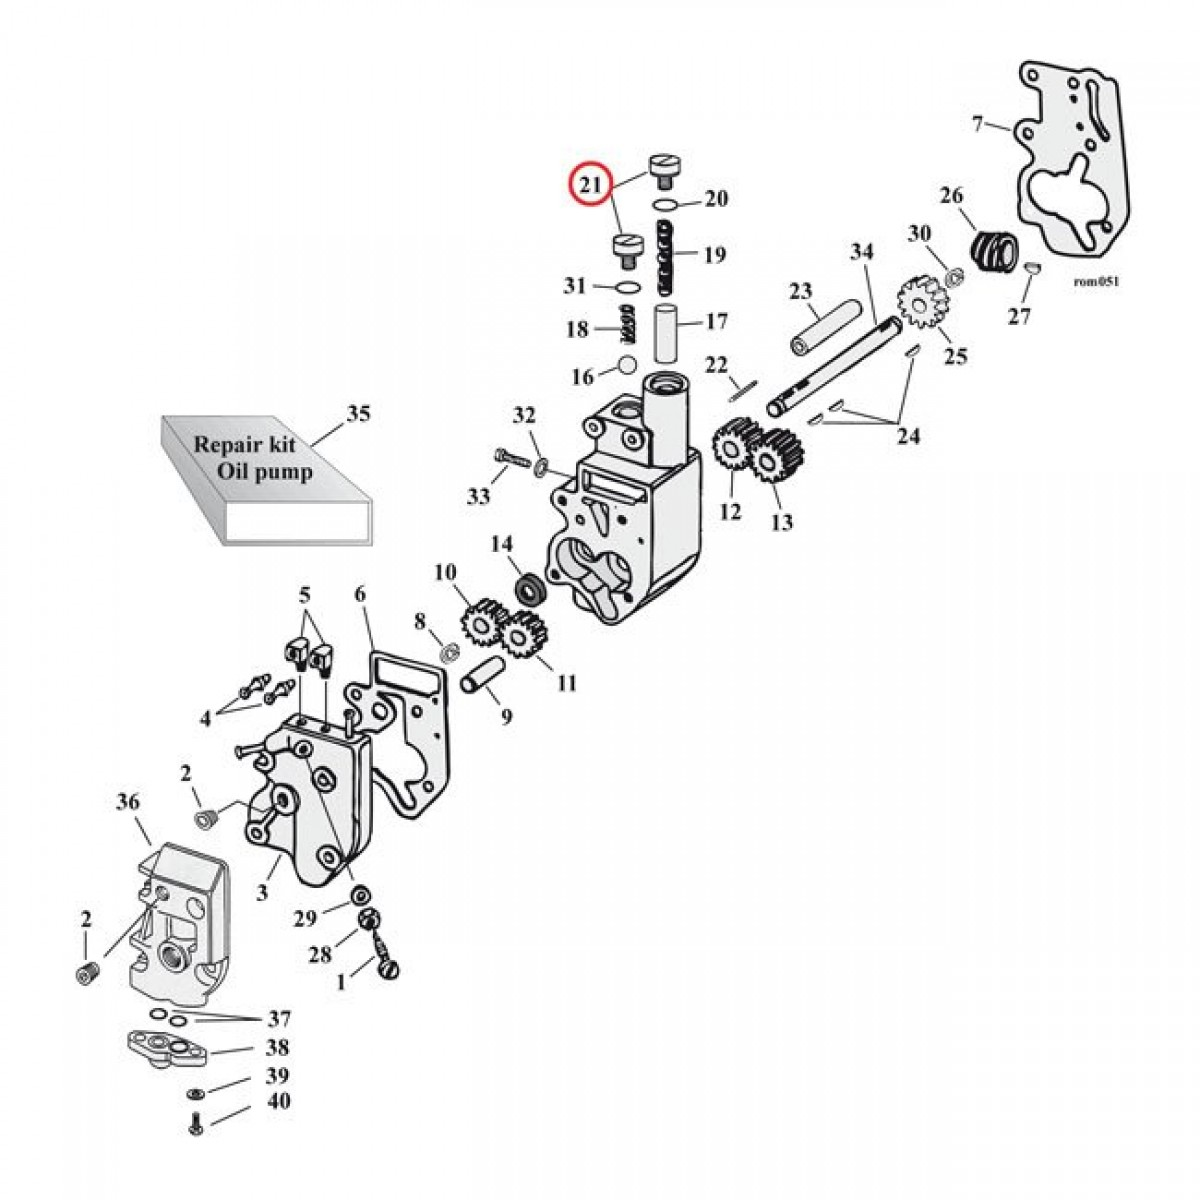 Tt 6098  Harley Davidson Oil Pump Diagram Wiring Diagram